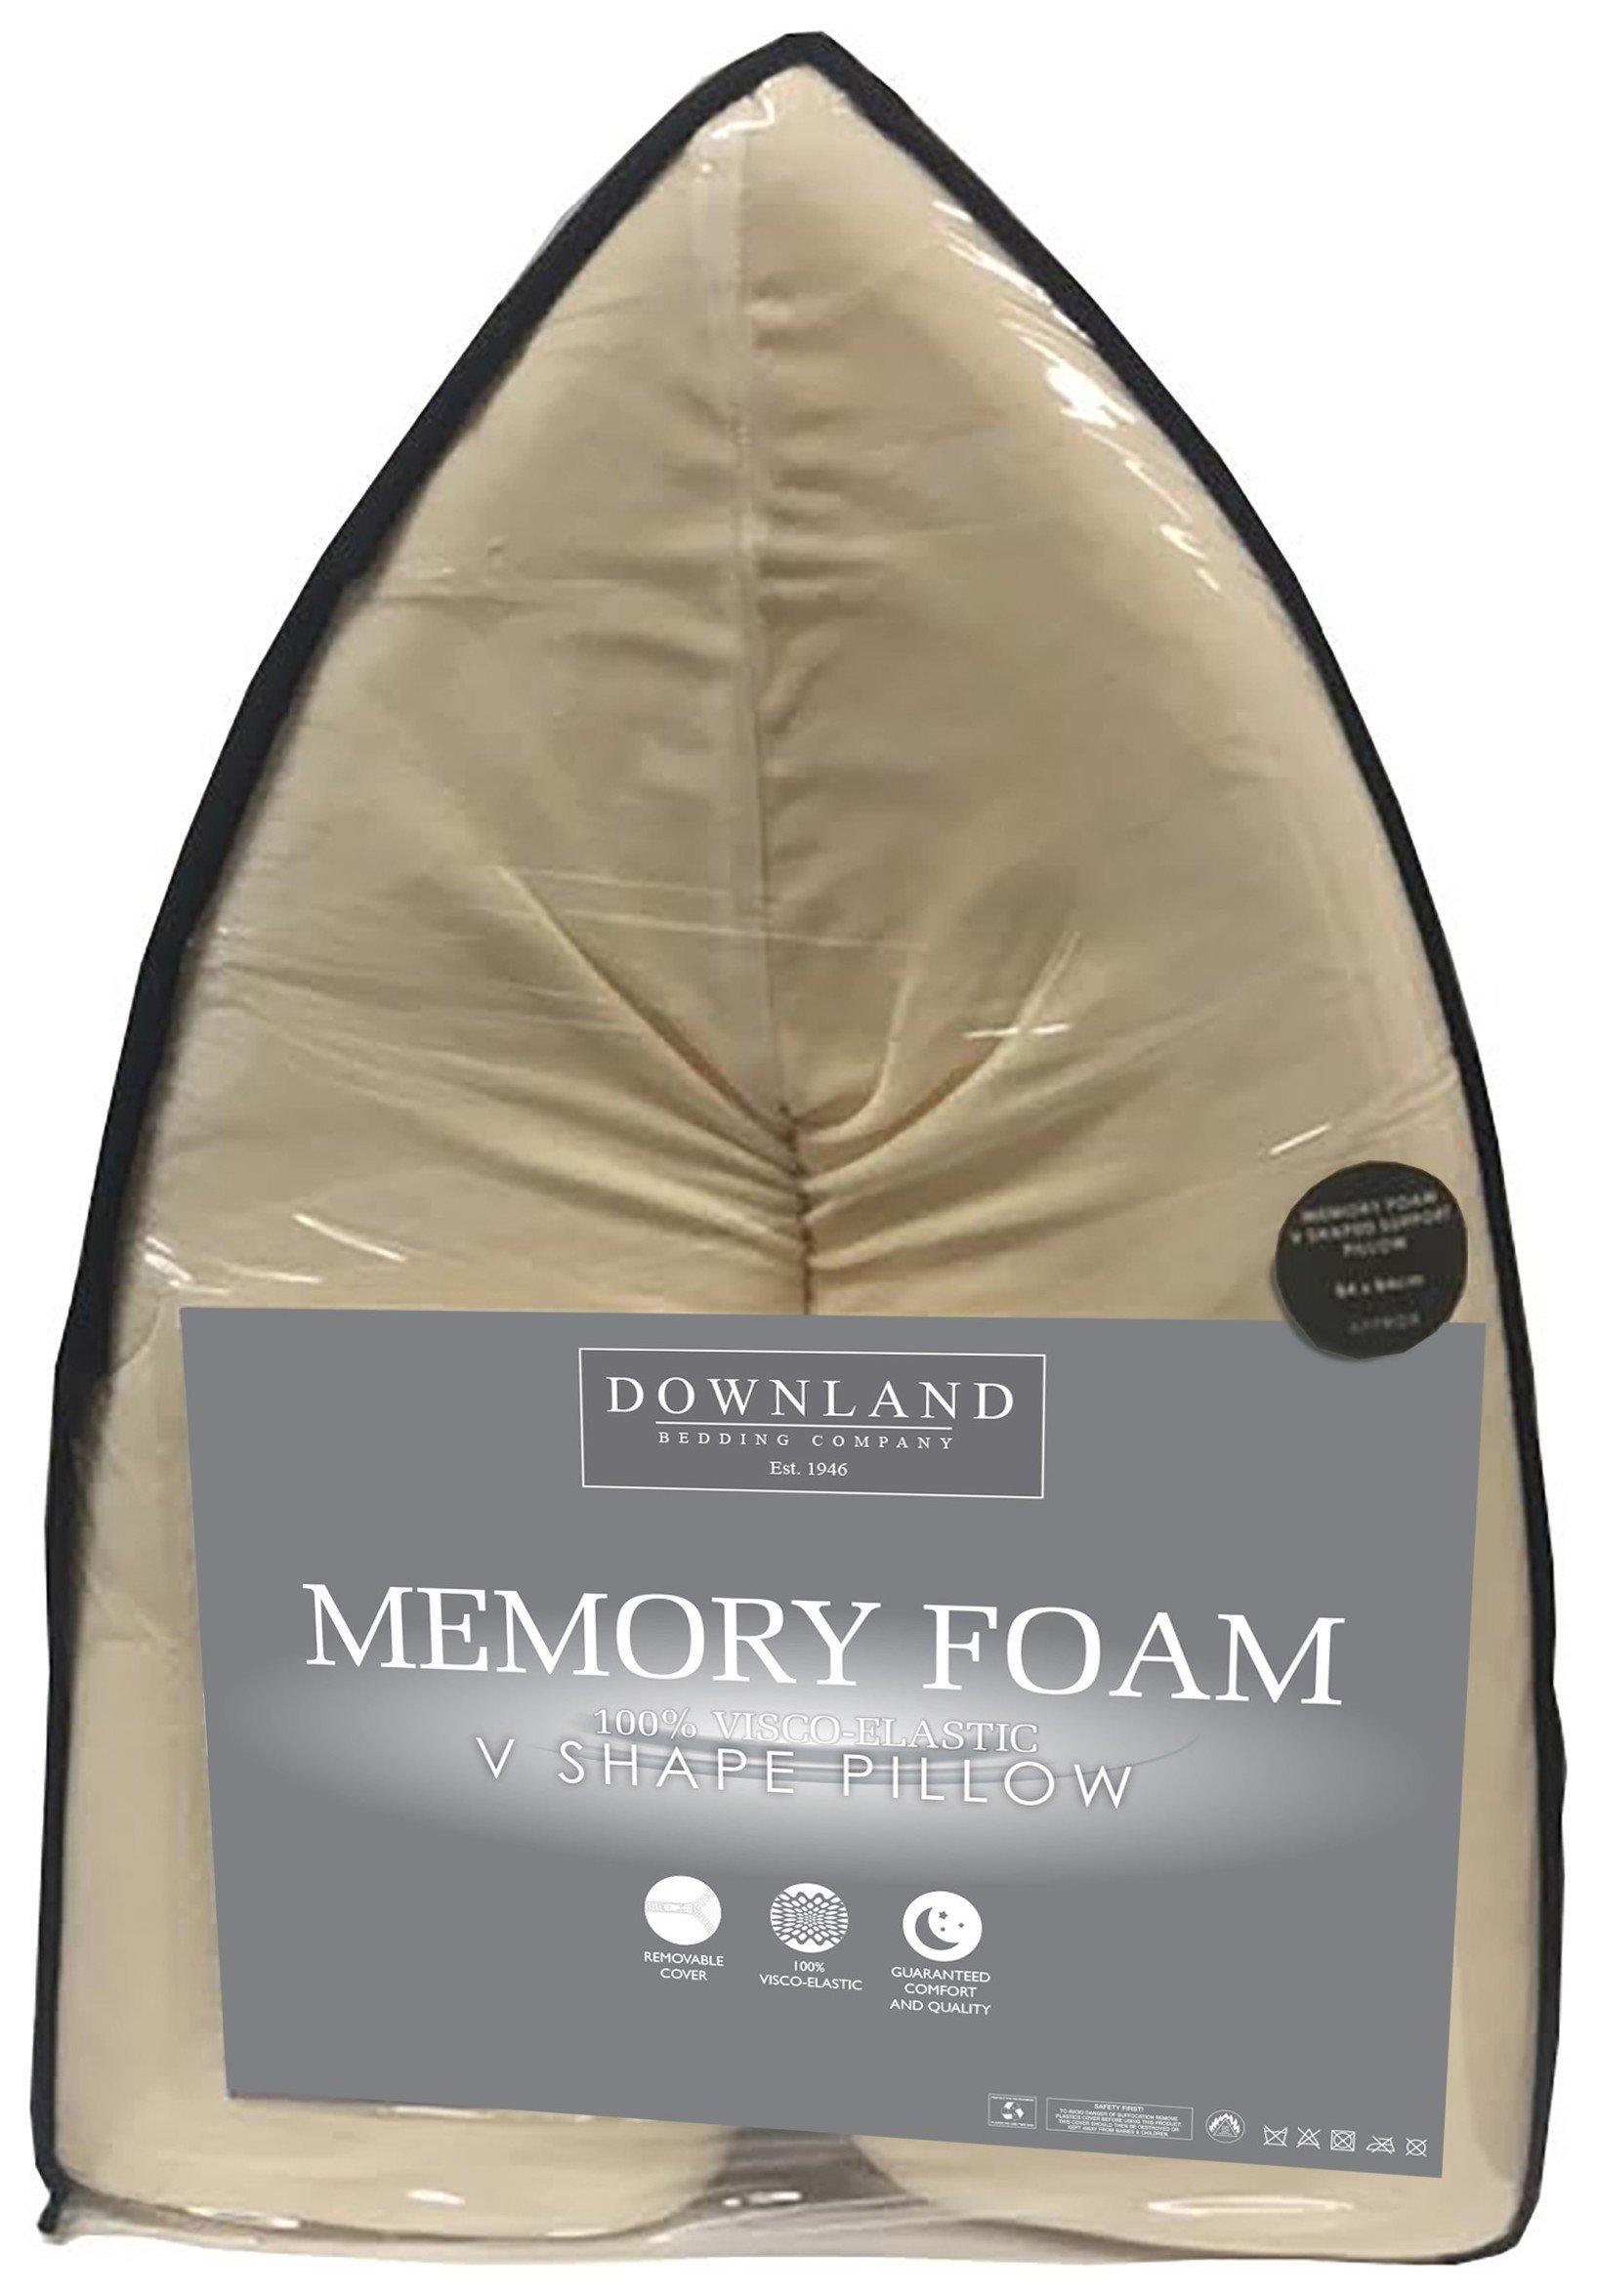 Image of Downland V Shaped Memory Foam Pillow